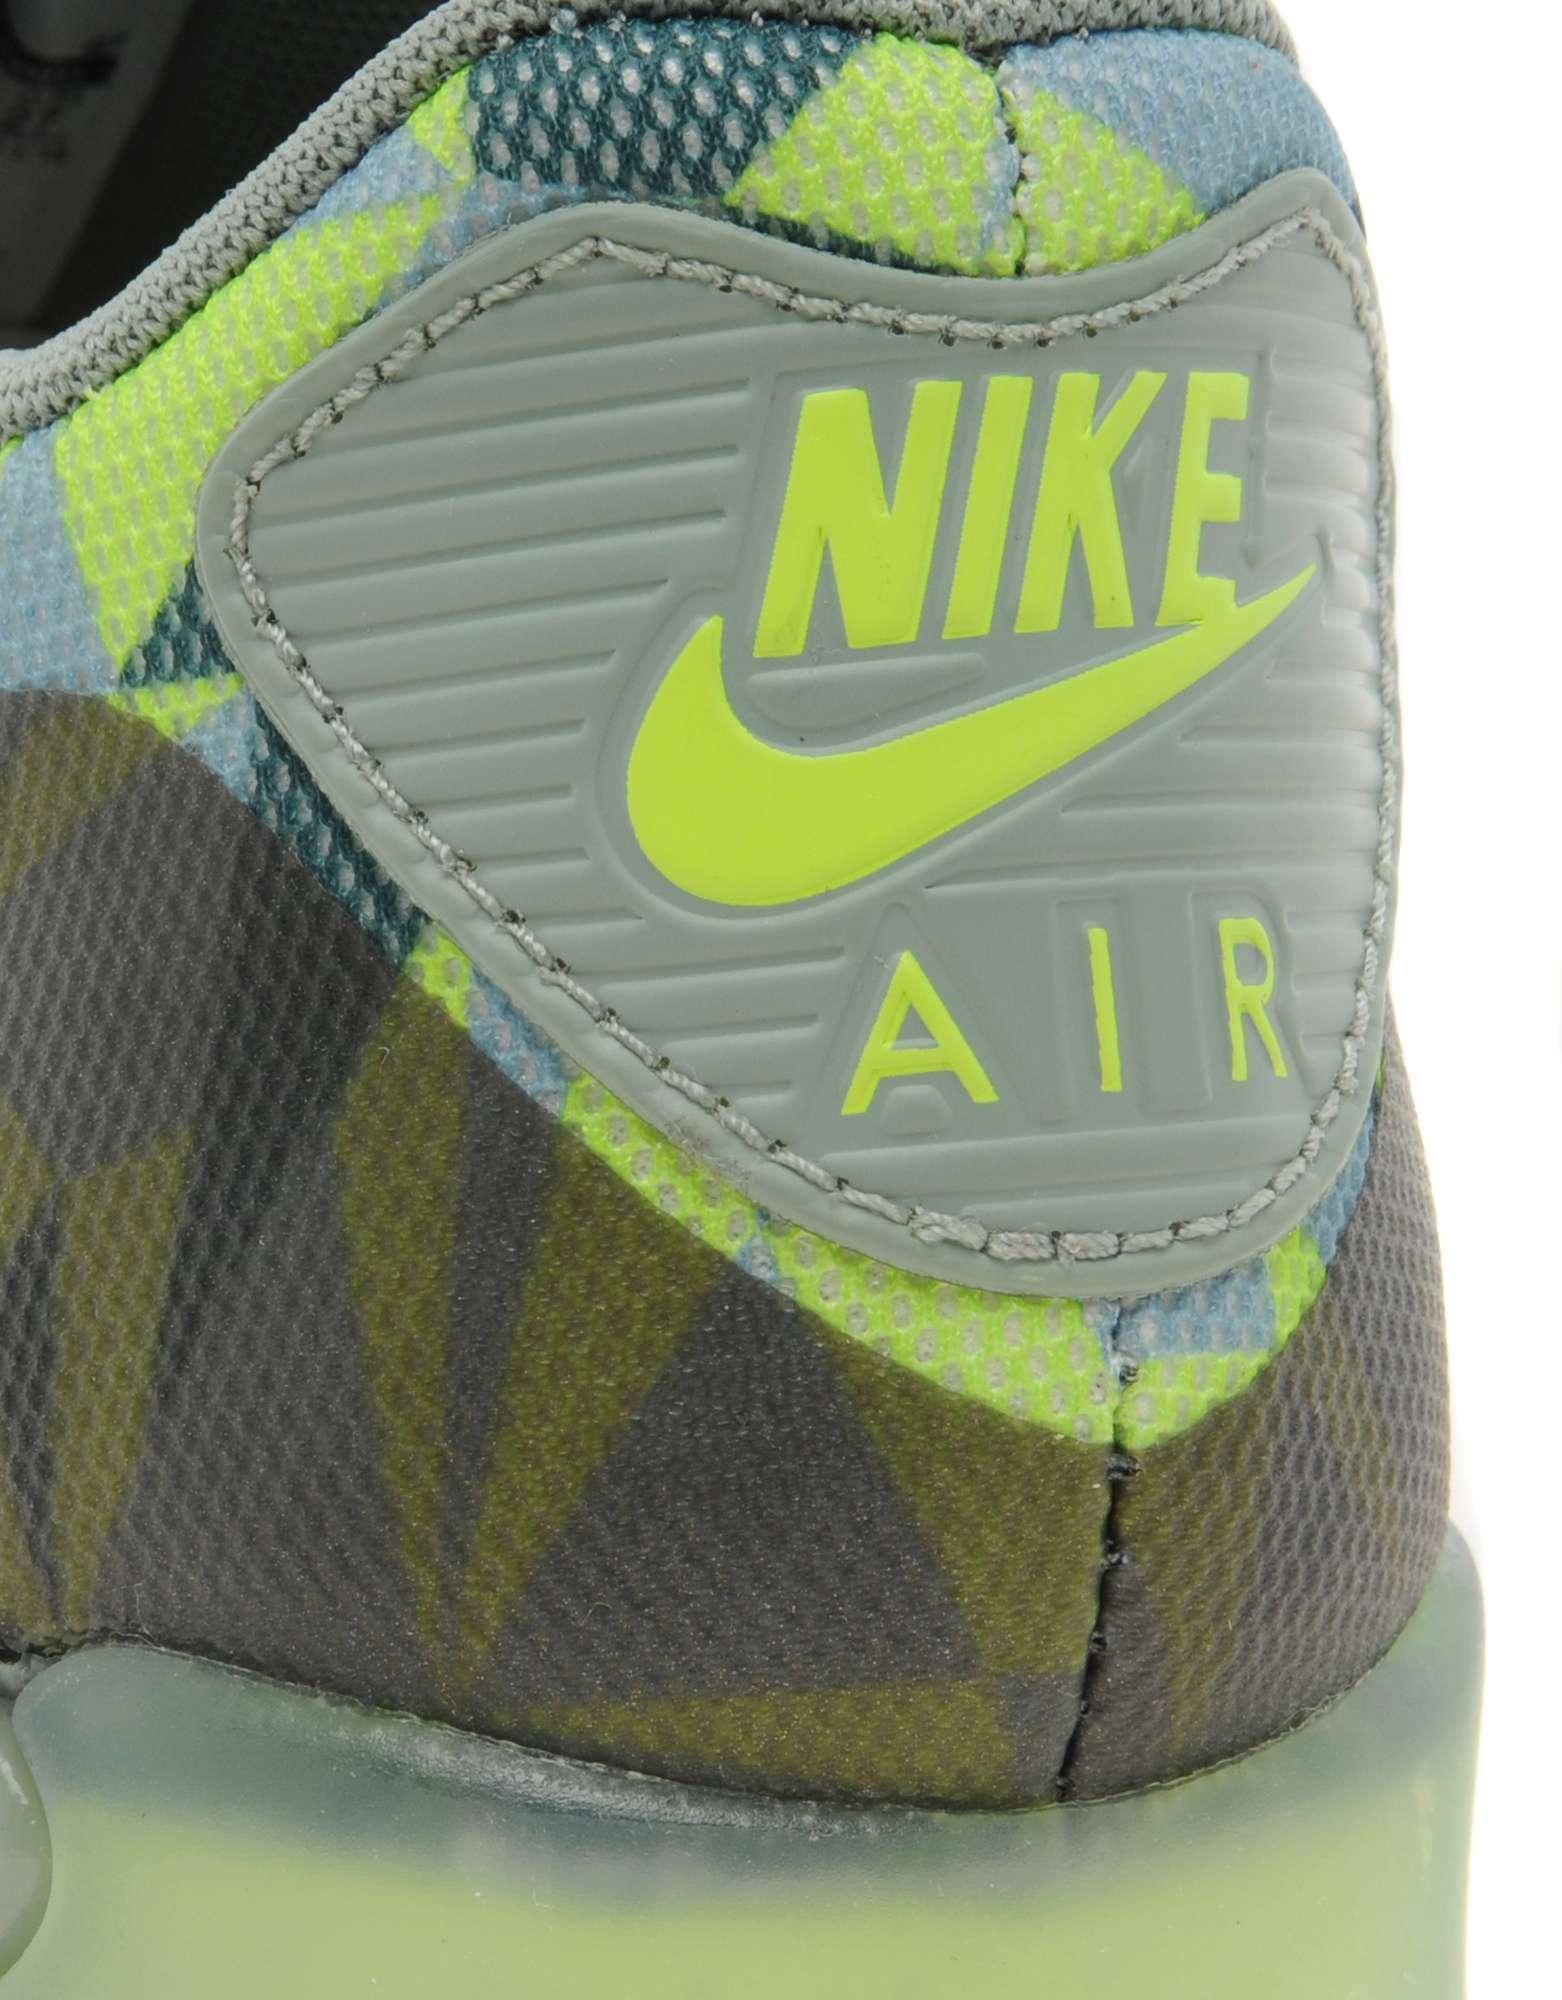 Nike Air Max 90 Ice